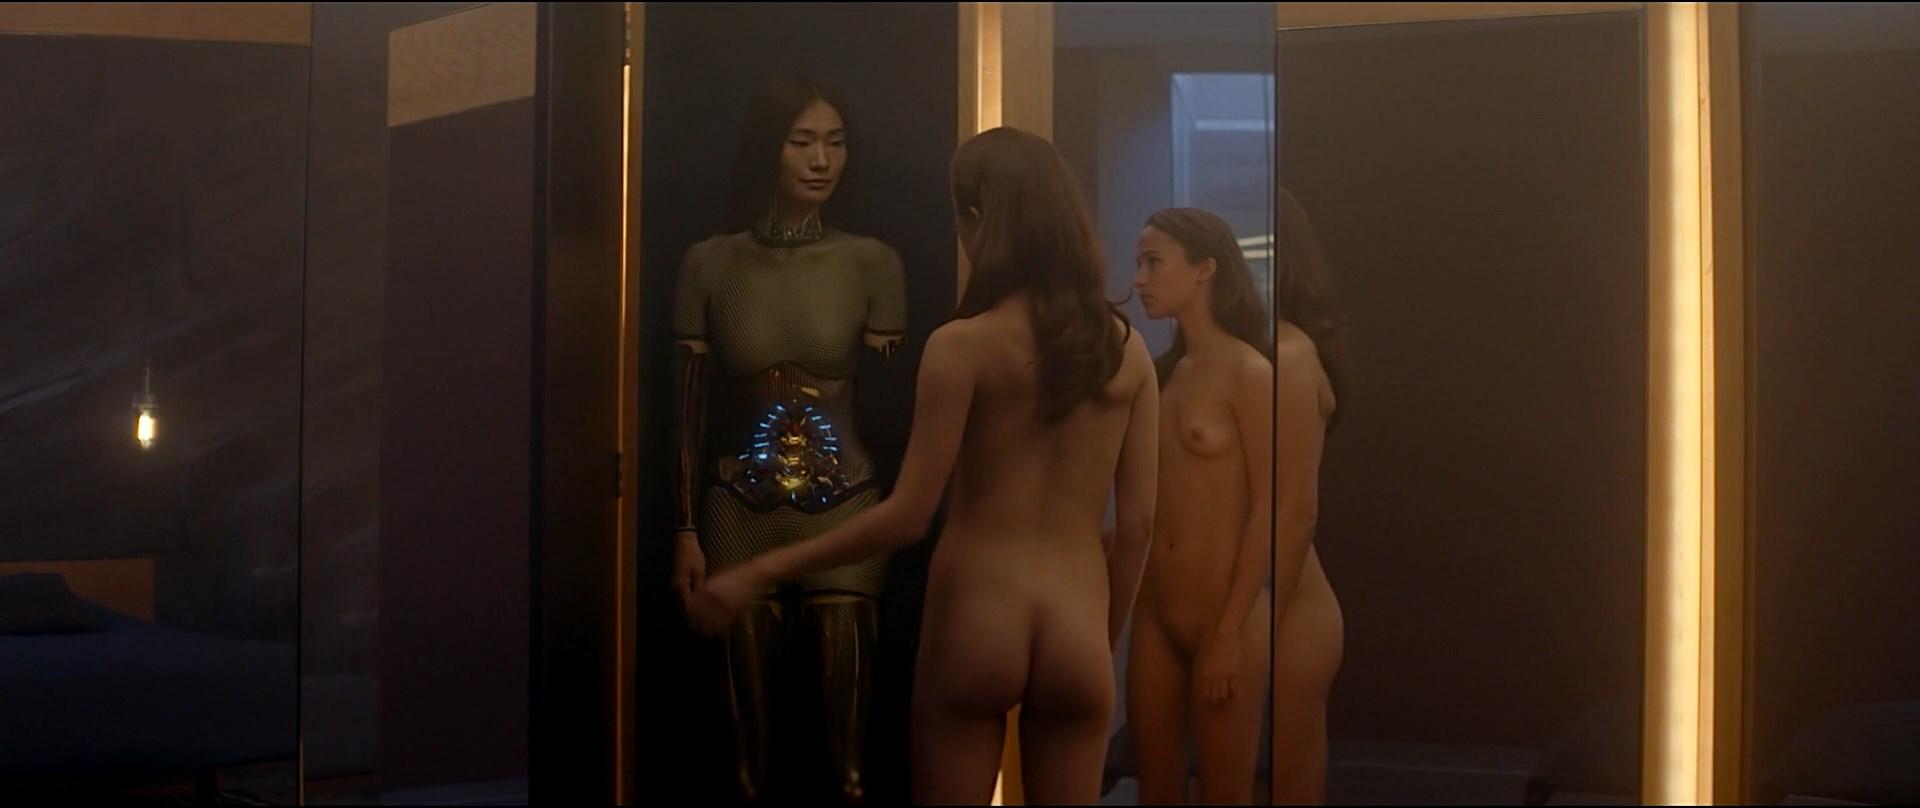 Undedhentai torrent nude scenes